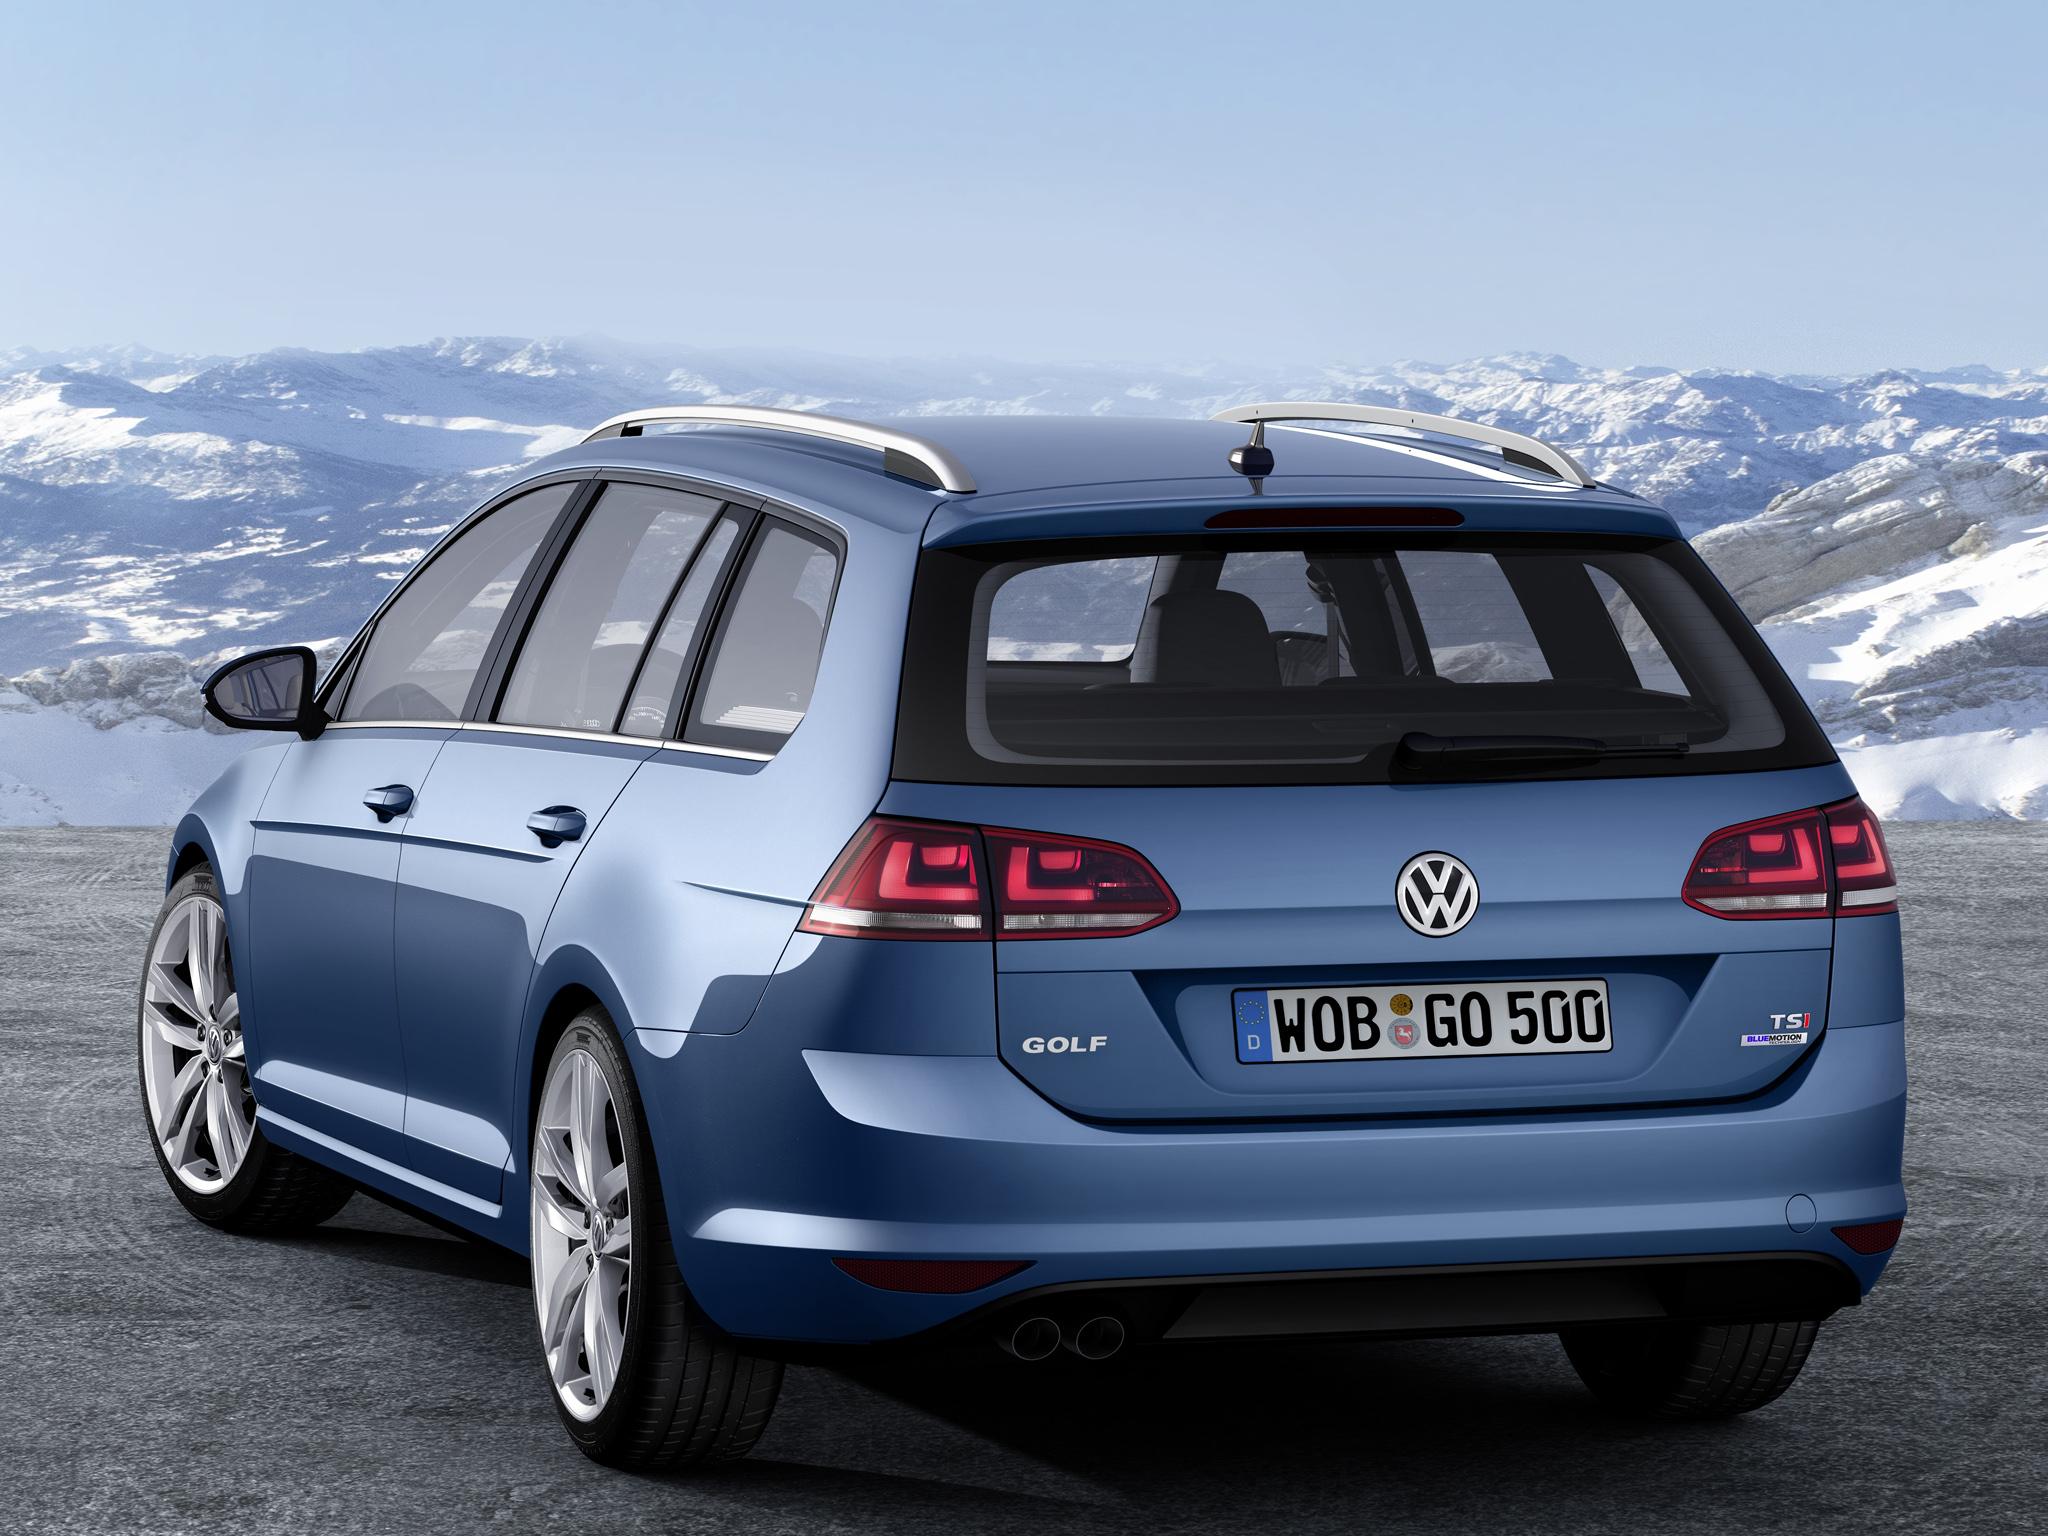 Универсал Volkswagen Golf 7 Variant, вид сзади